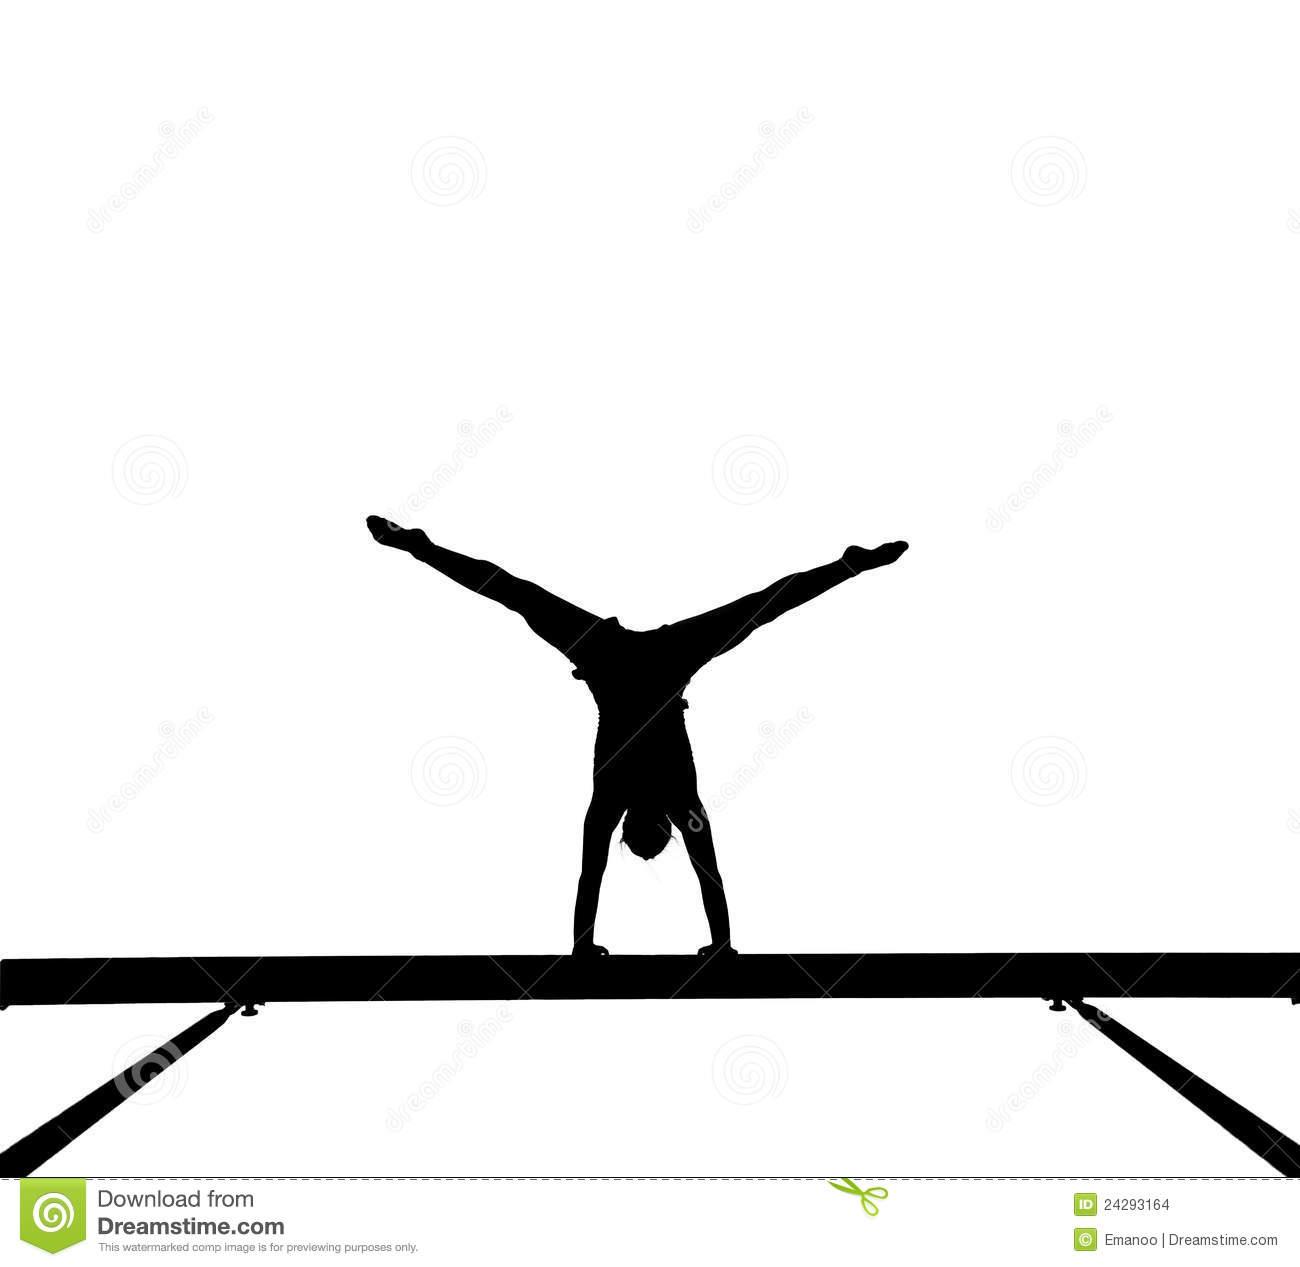 Gymnastics clipart silhouette vault banner royalty free Gymnastics Clipart Silhouette Vault | Clipart Panda - Free Clipart ... banner royalty free